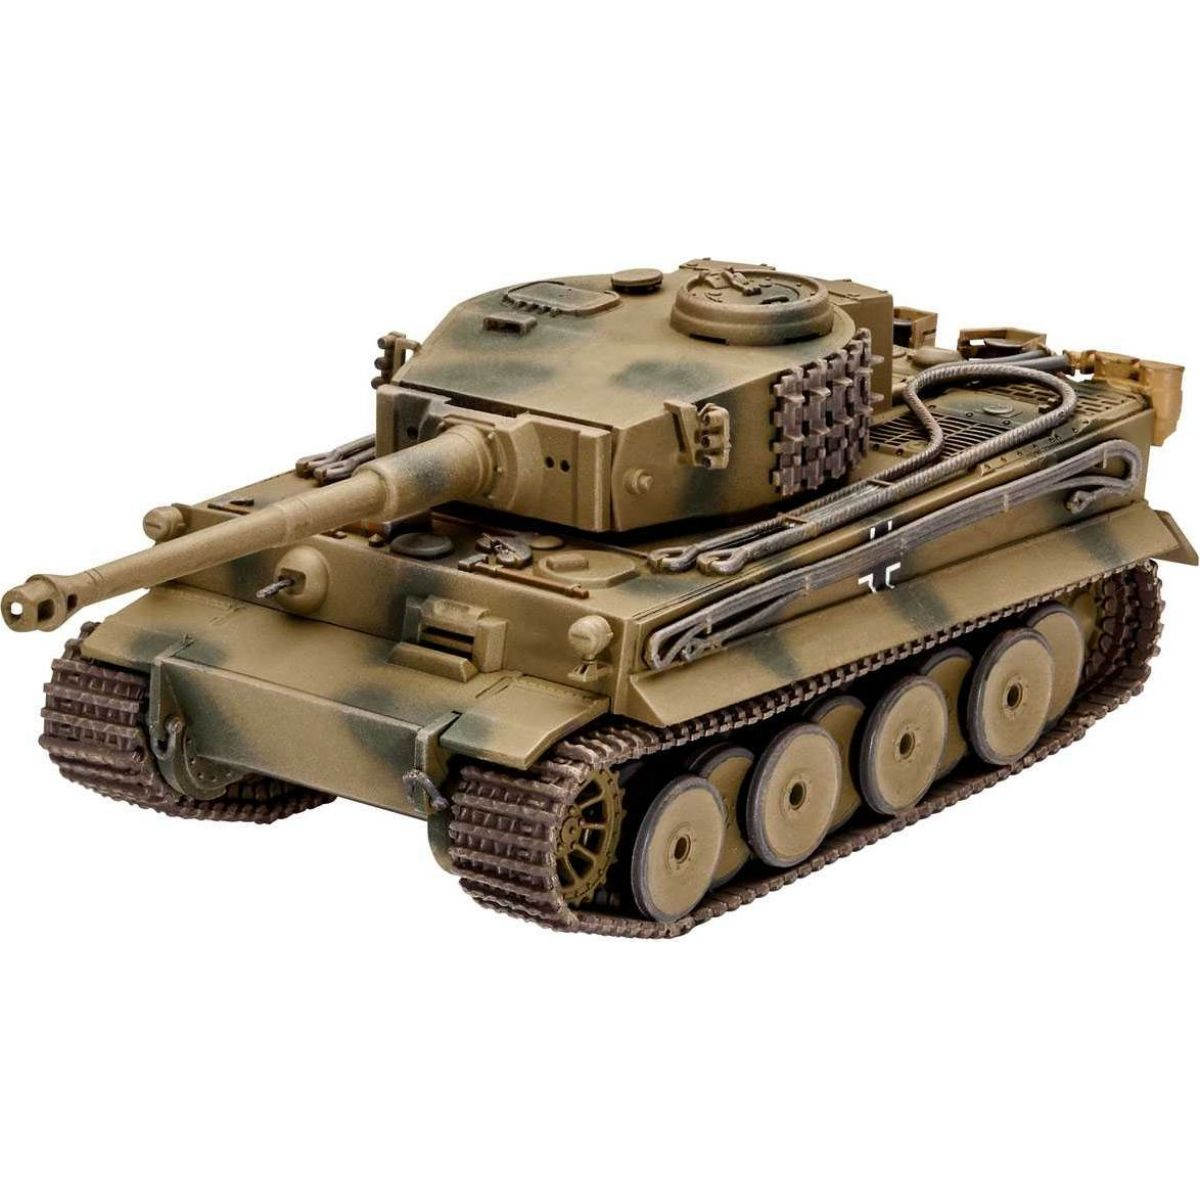 Revell Plastic ModelKit tank PzKpfw VI Ausf. H Tiger 1:72